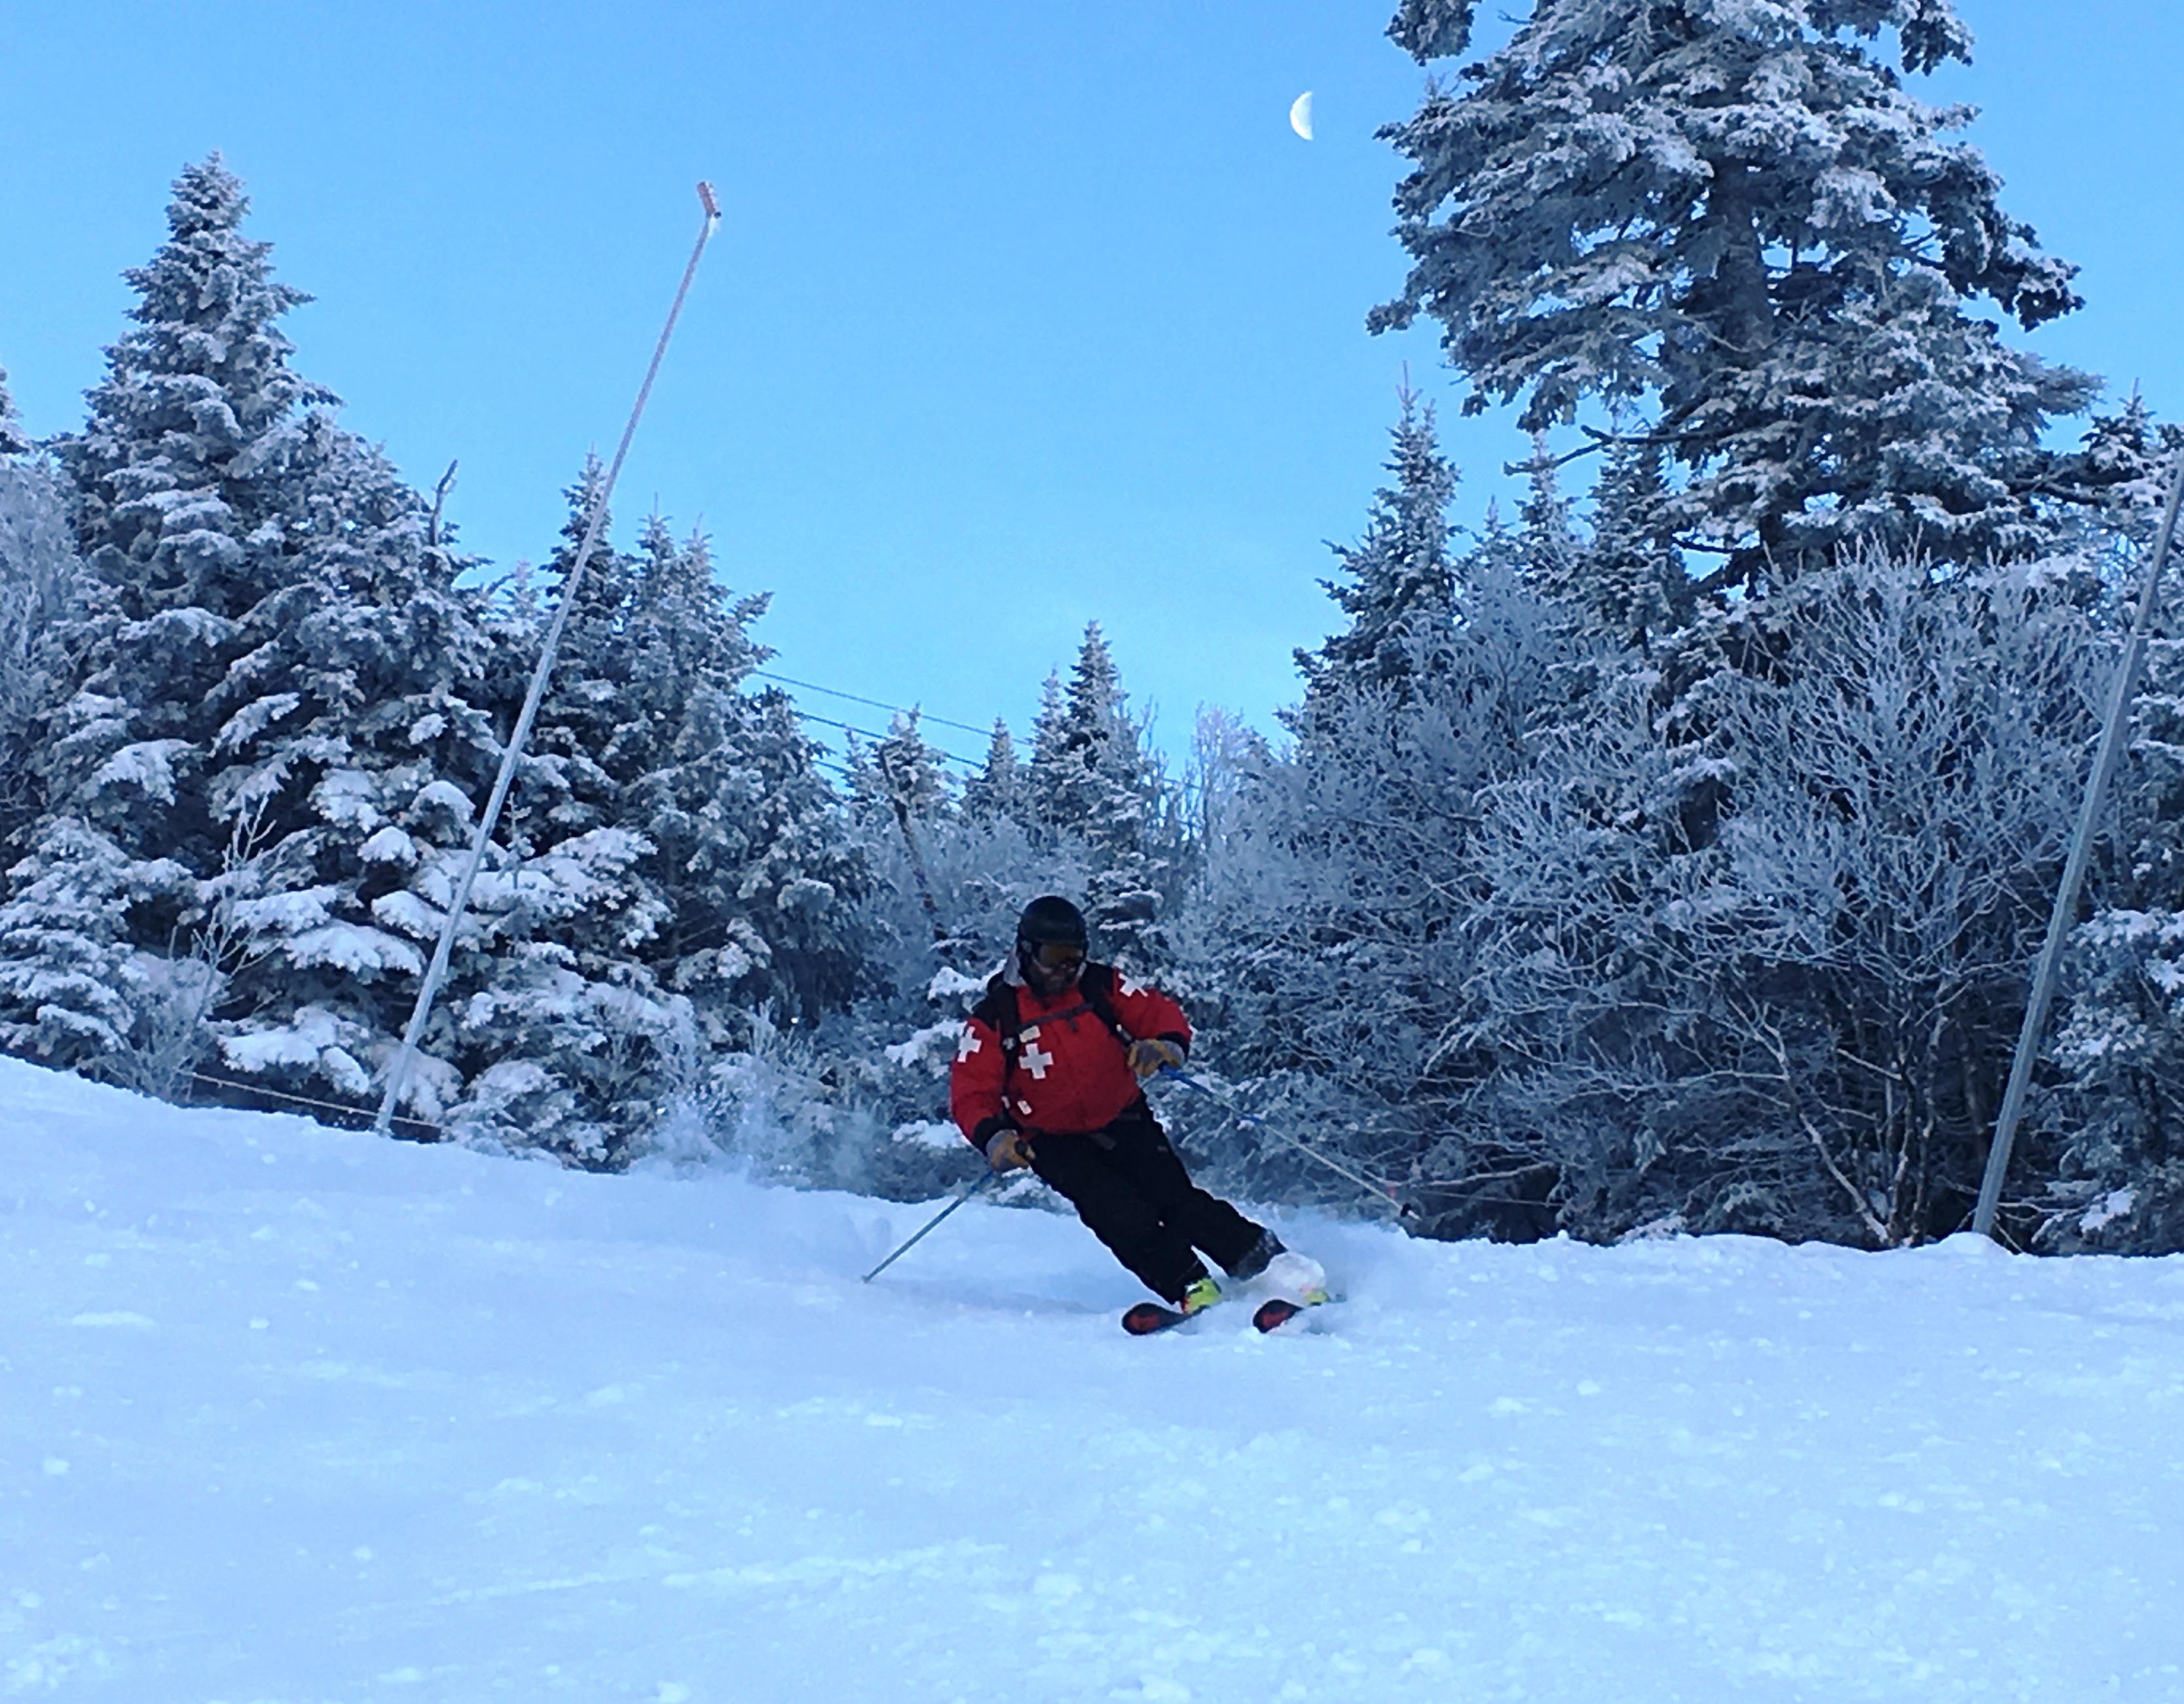 Ski Patrol January 20, 2017